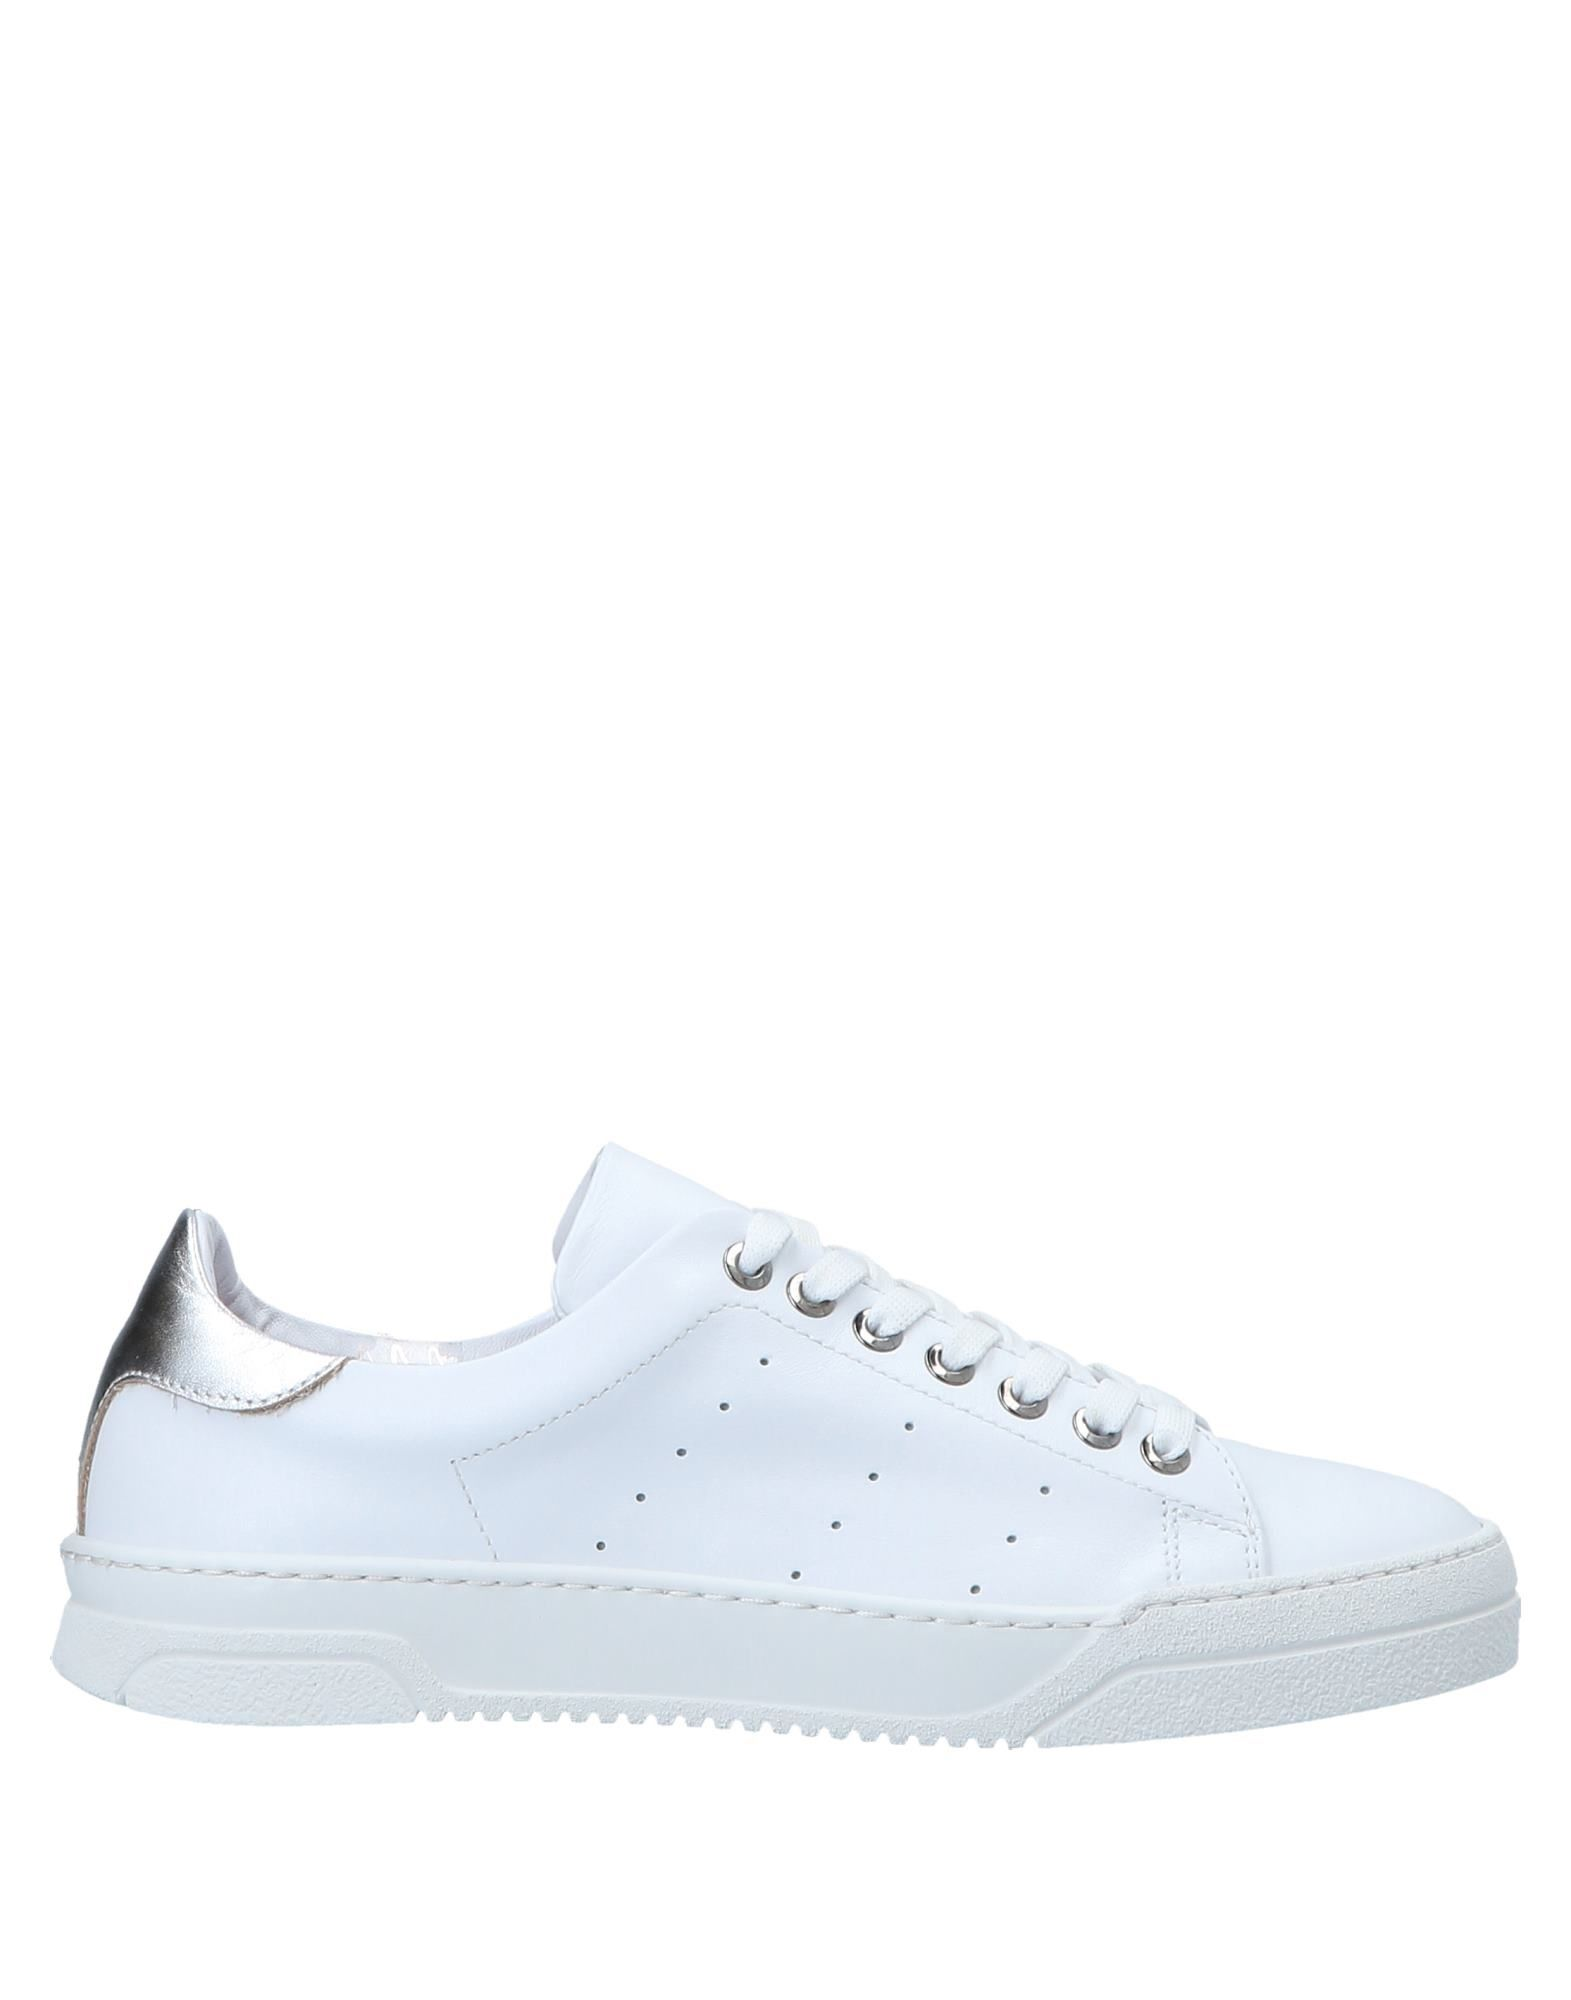 Gianfranco Lattanzi Sneakers Damen  11547258JHGut aussehende strapazierfähige Schuhe